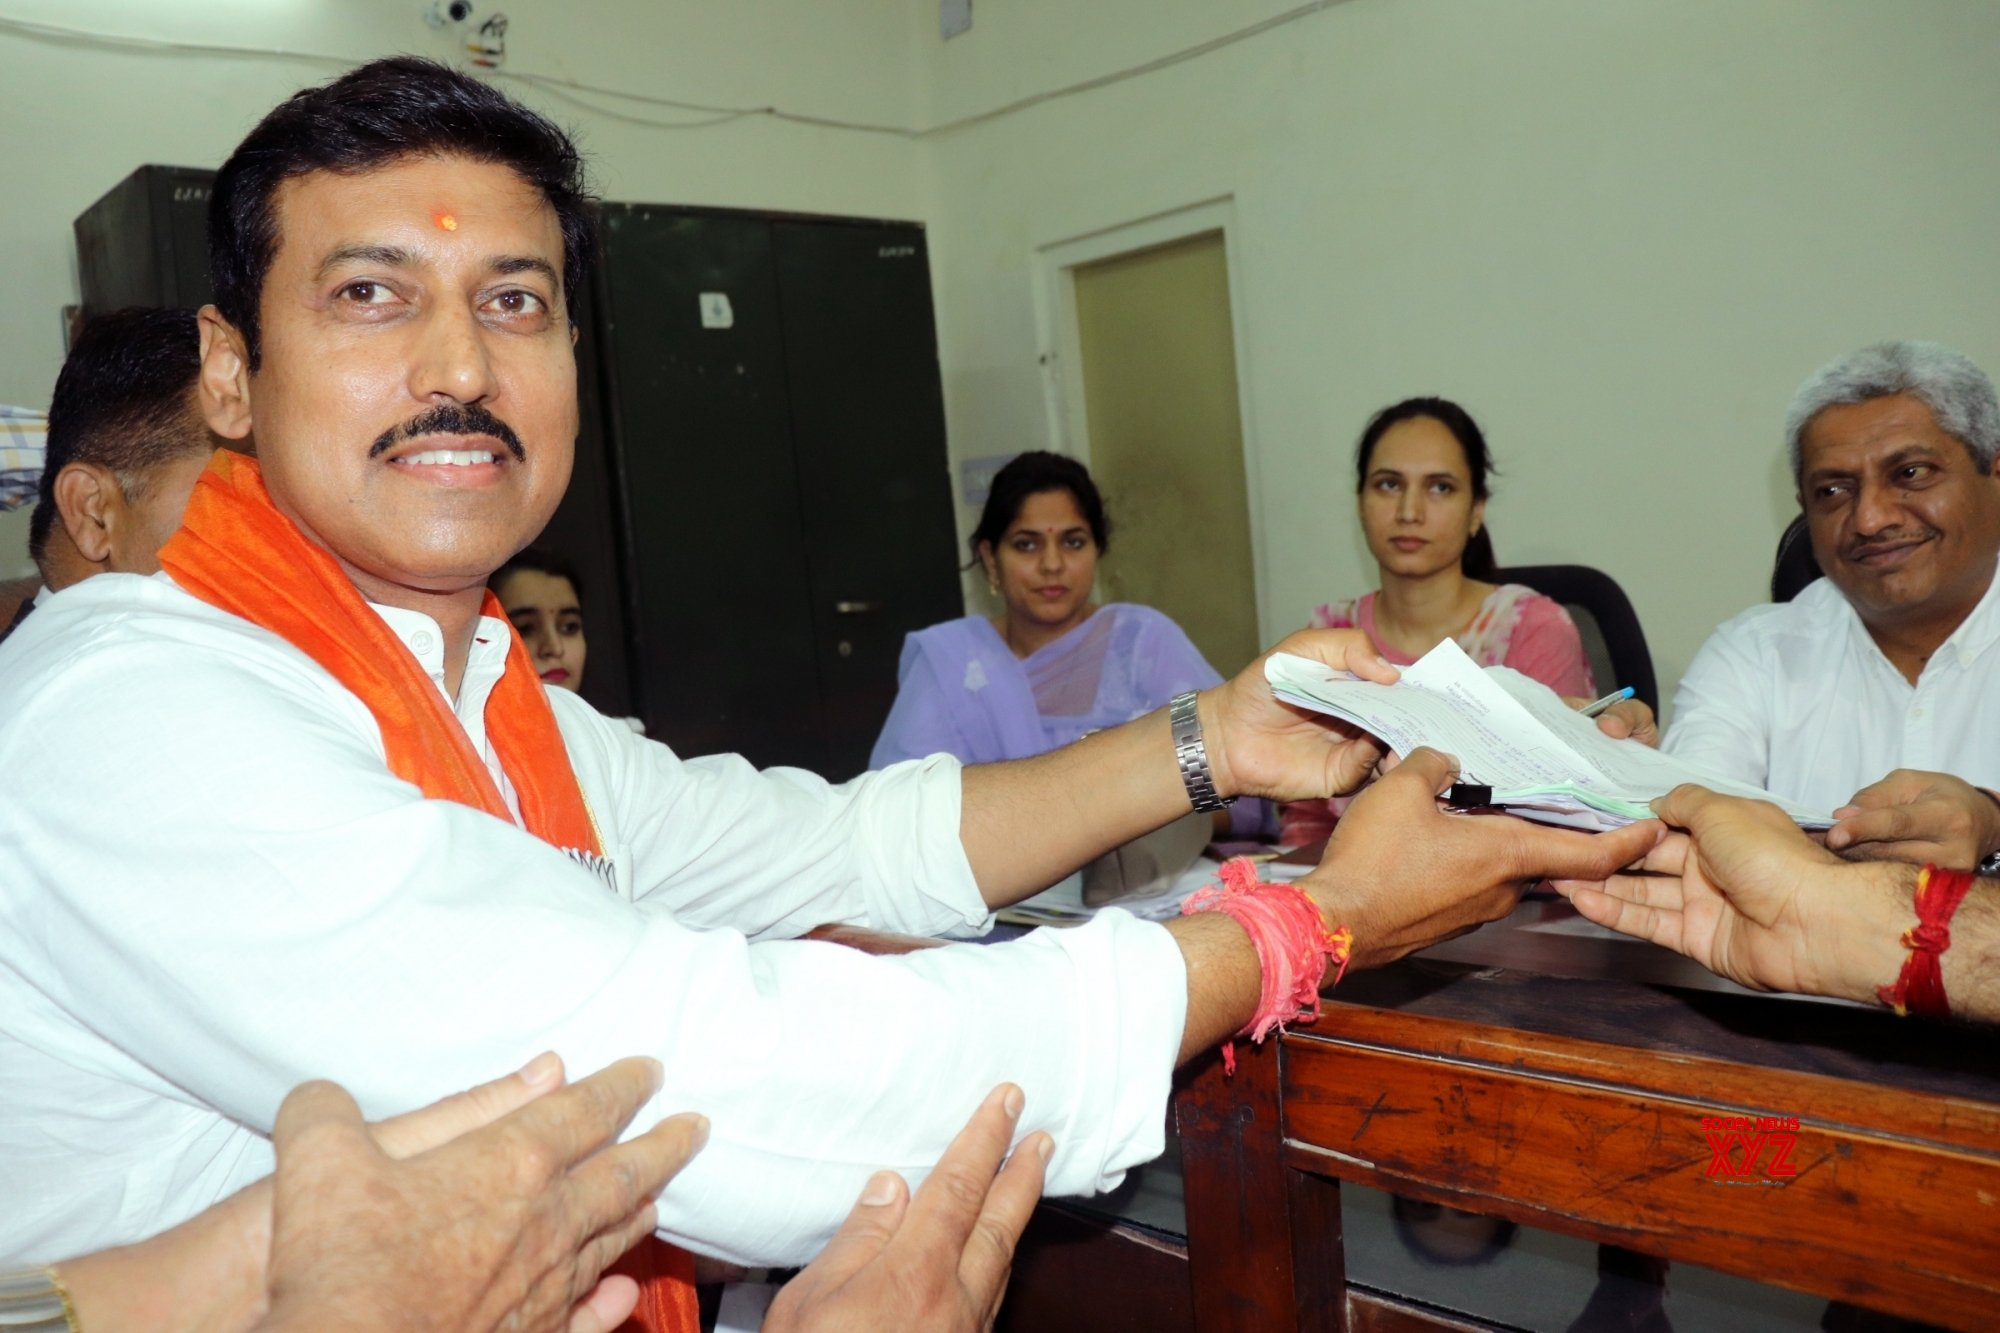 Jaipur: 2019 Lok Sabha elections - Rajyavardhan Singh Rathore files nomination (Batch - 2) #Gallery